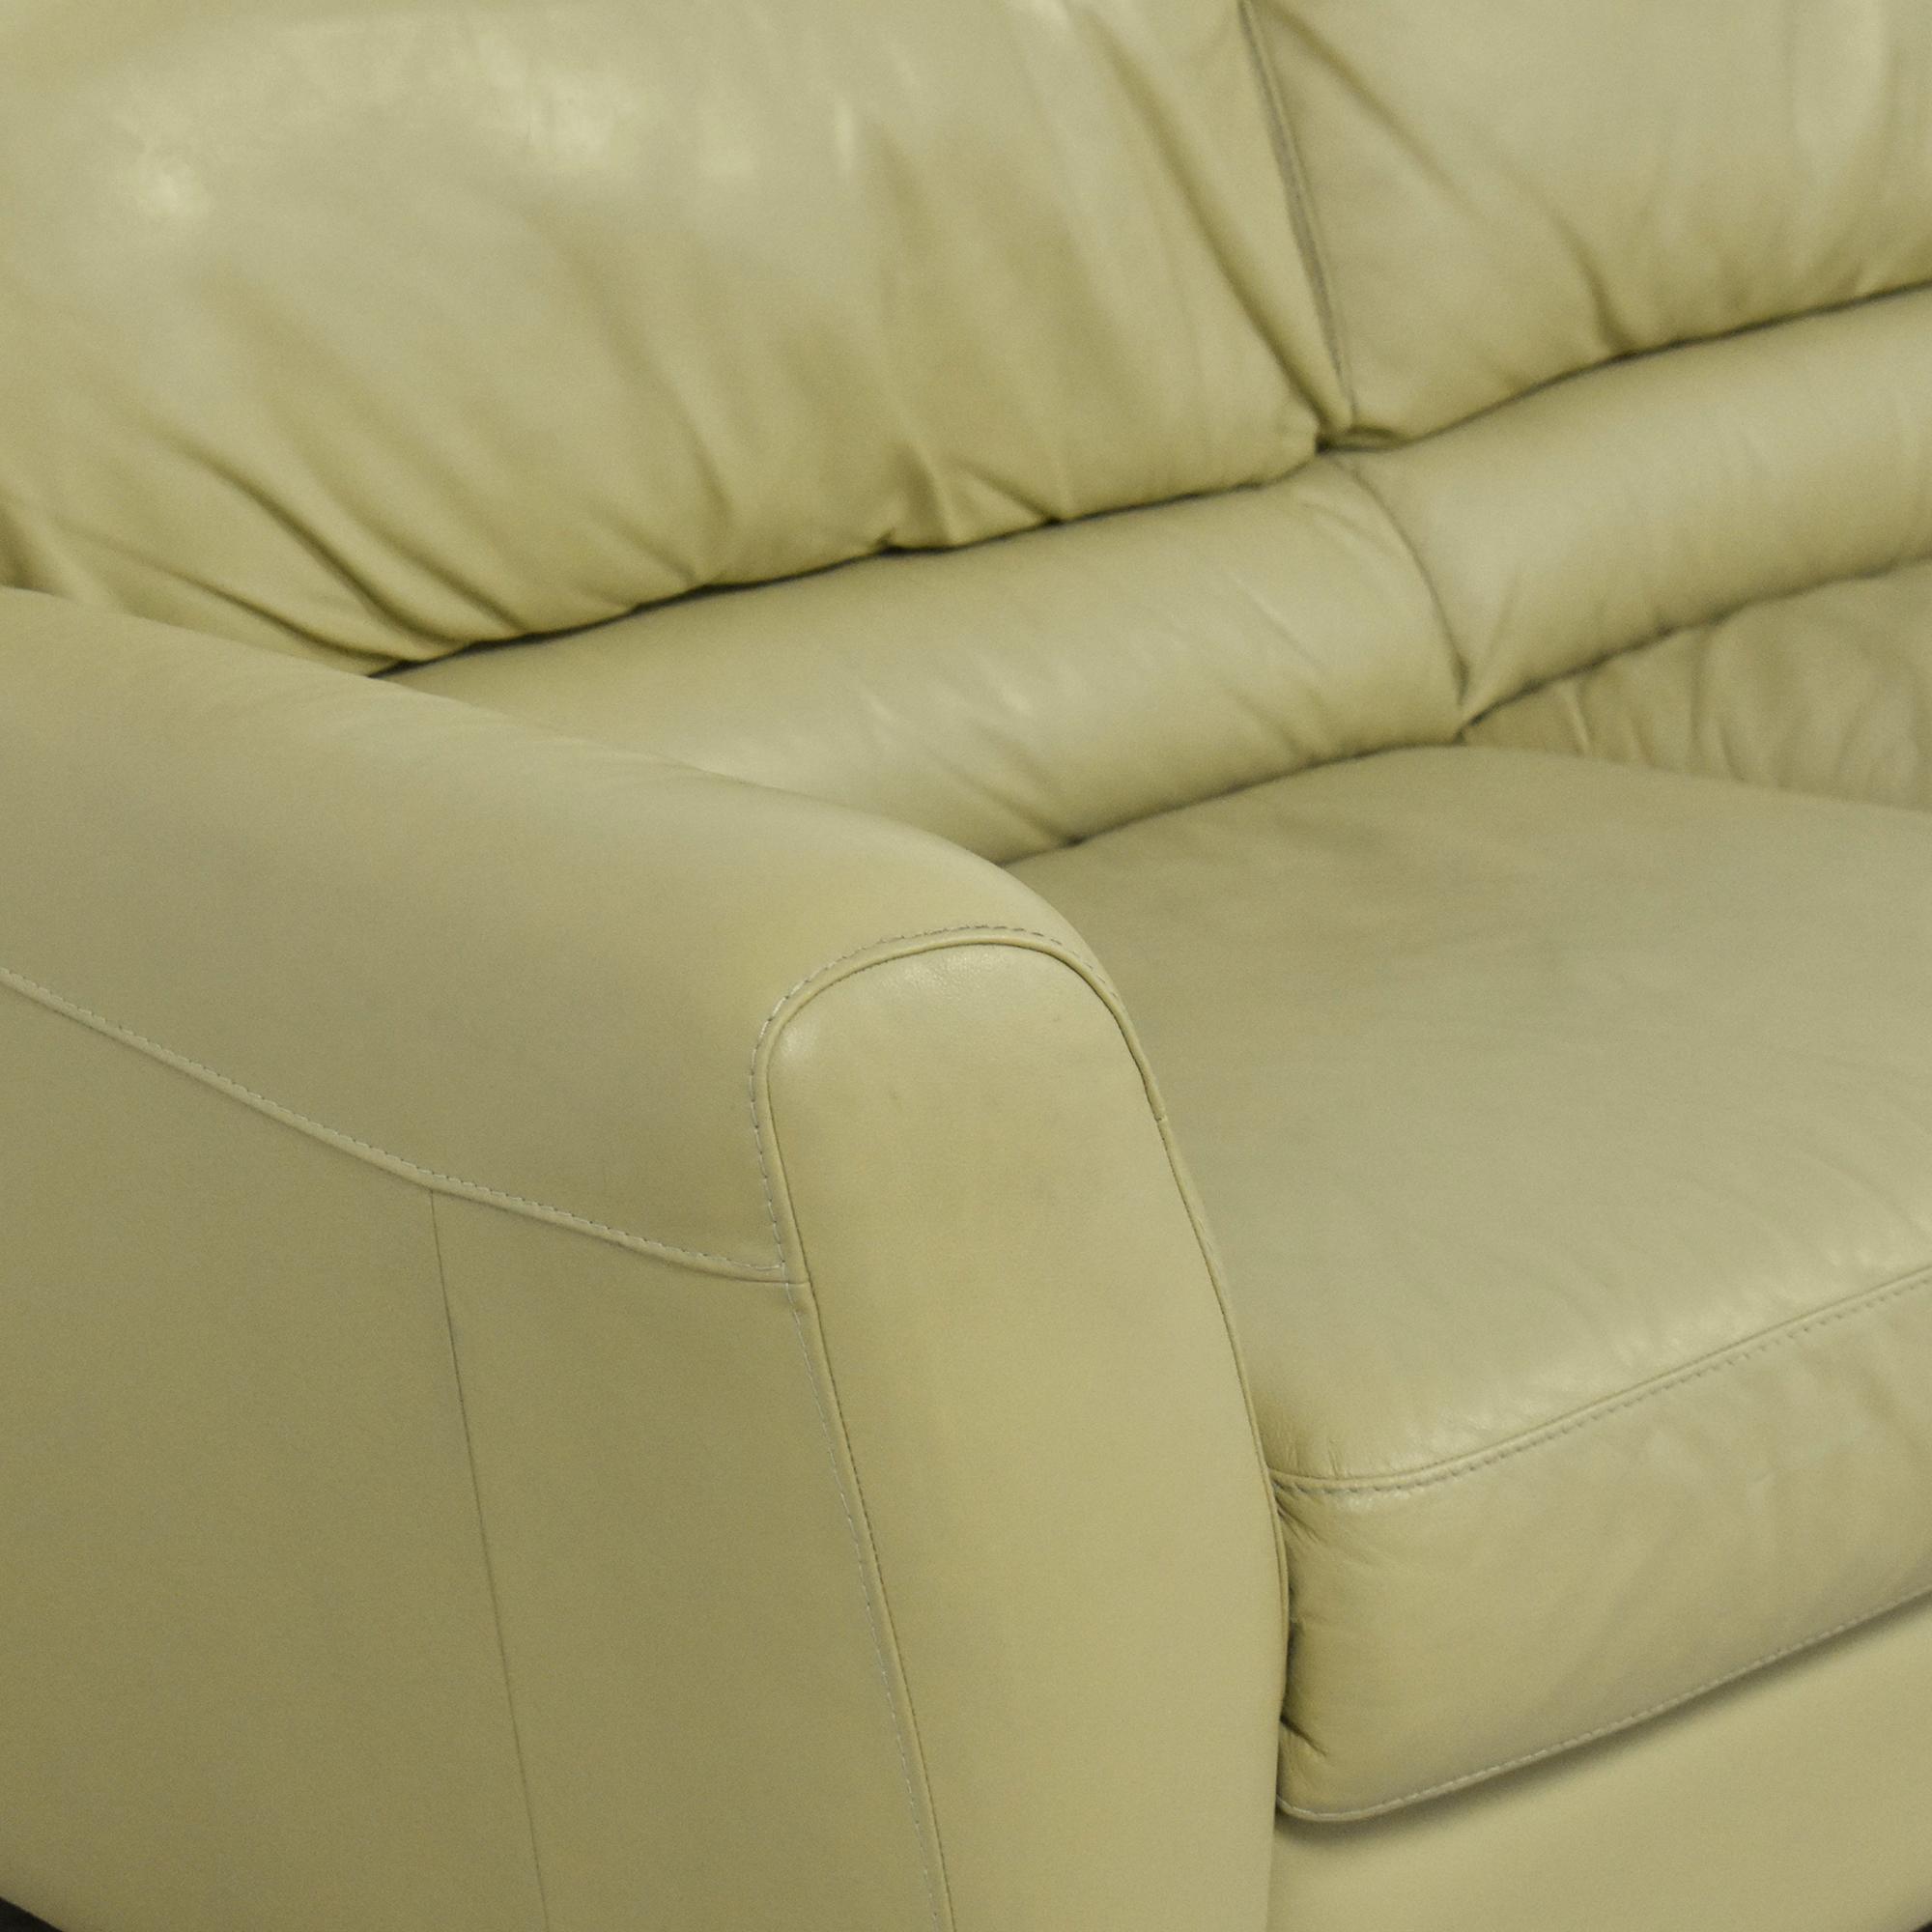 Italsofa Italsofa Two Cushion Sofa nj